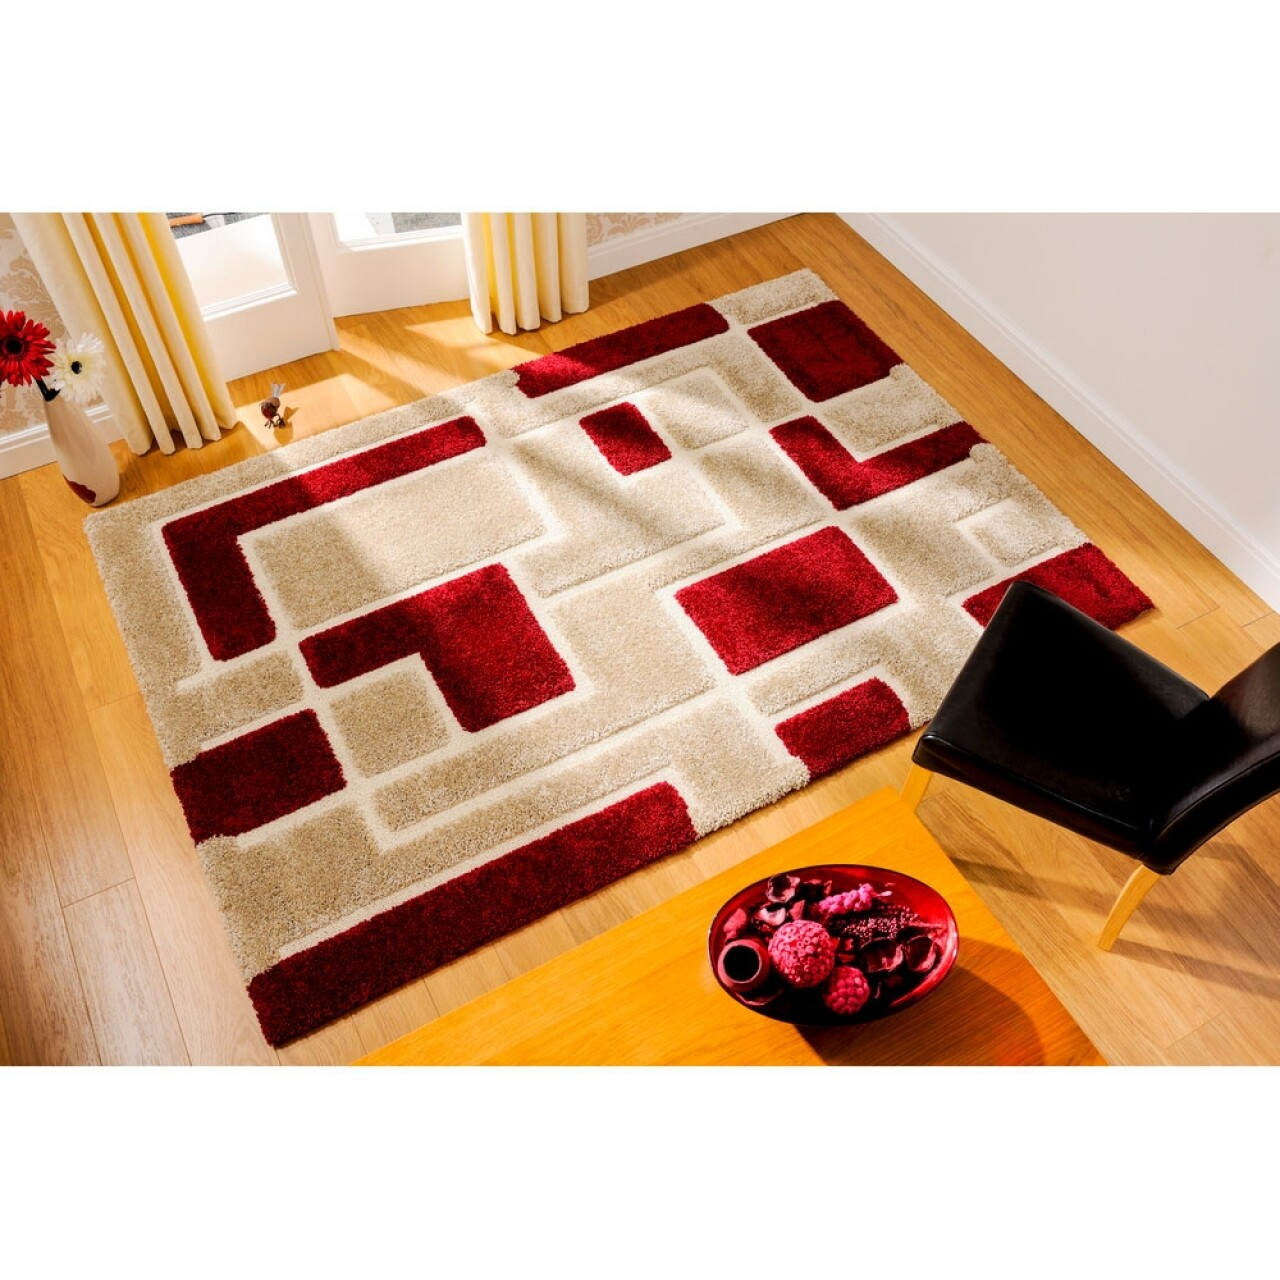 Covor Venice Imperial Red, Flair Rugs, 80 x 150 cm, 100% polipropilena Heatset, rosu/bej